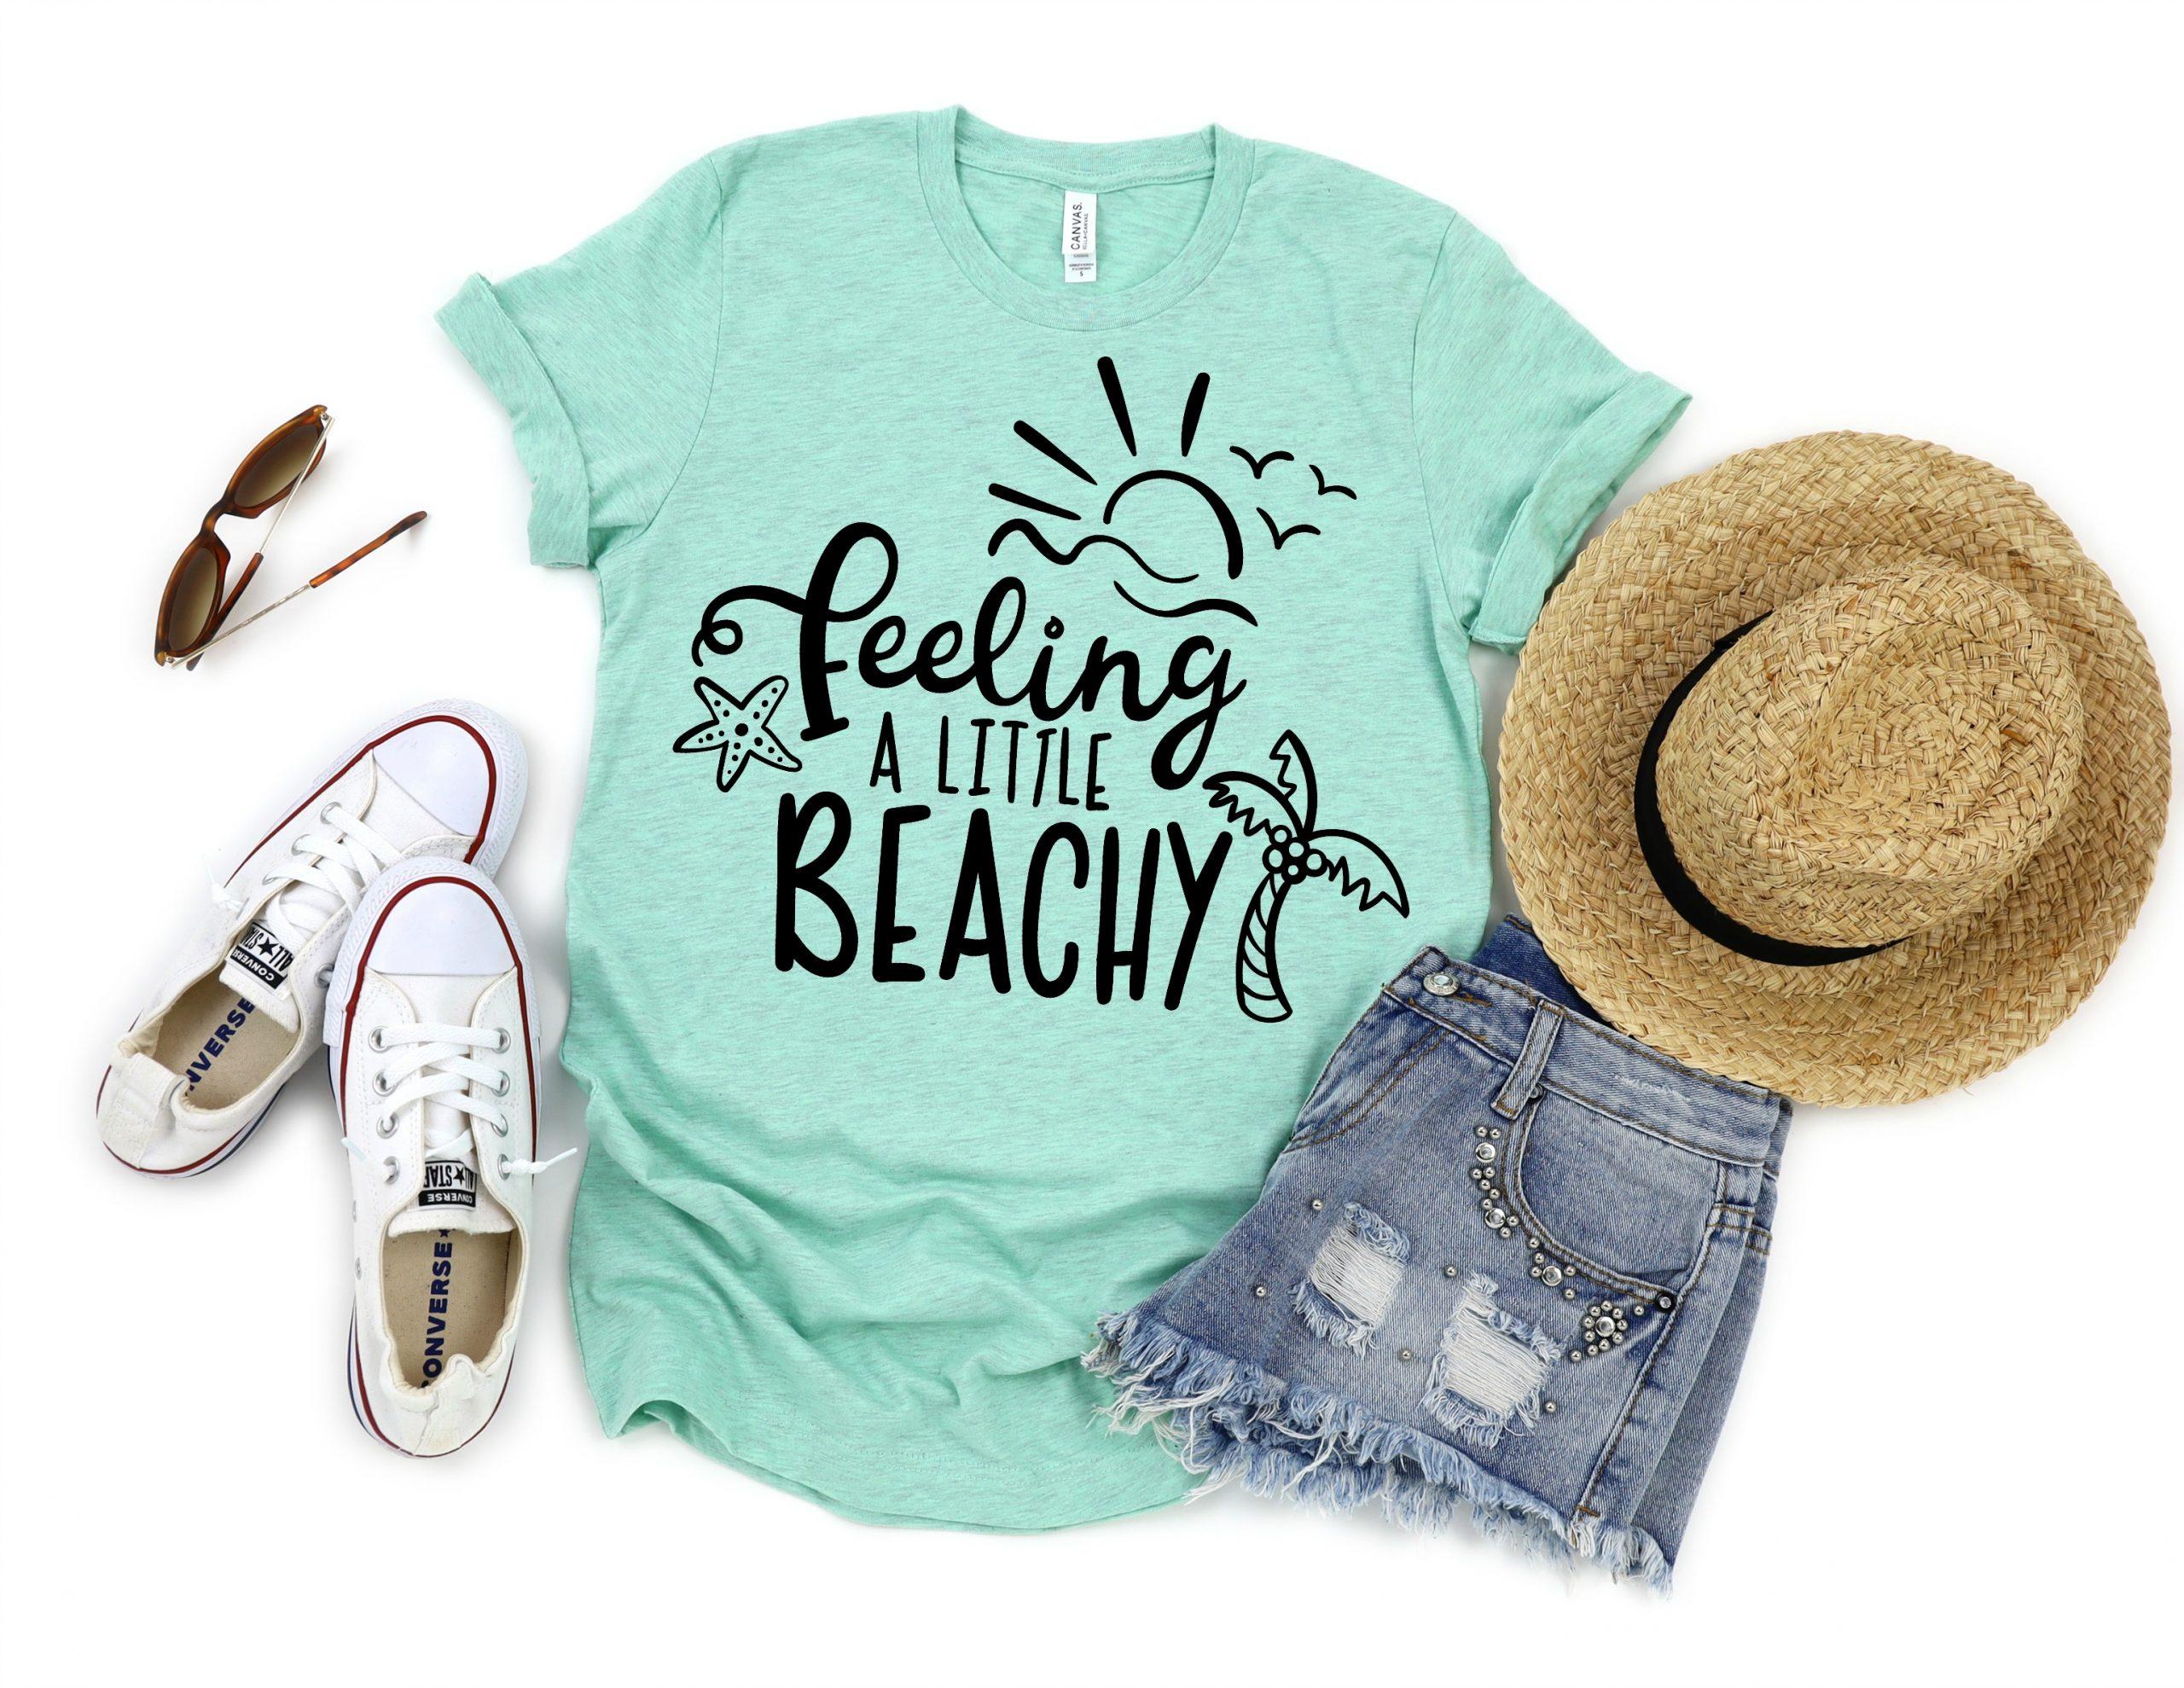 Feeling a little Beachy SVG Cut file on Green Shirt